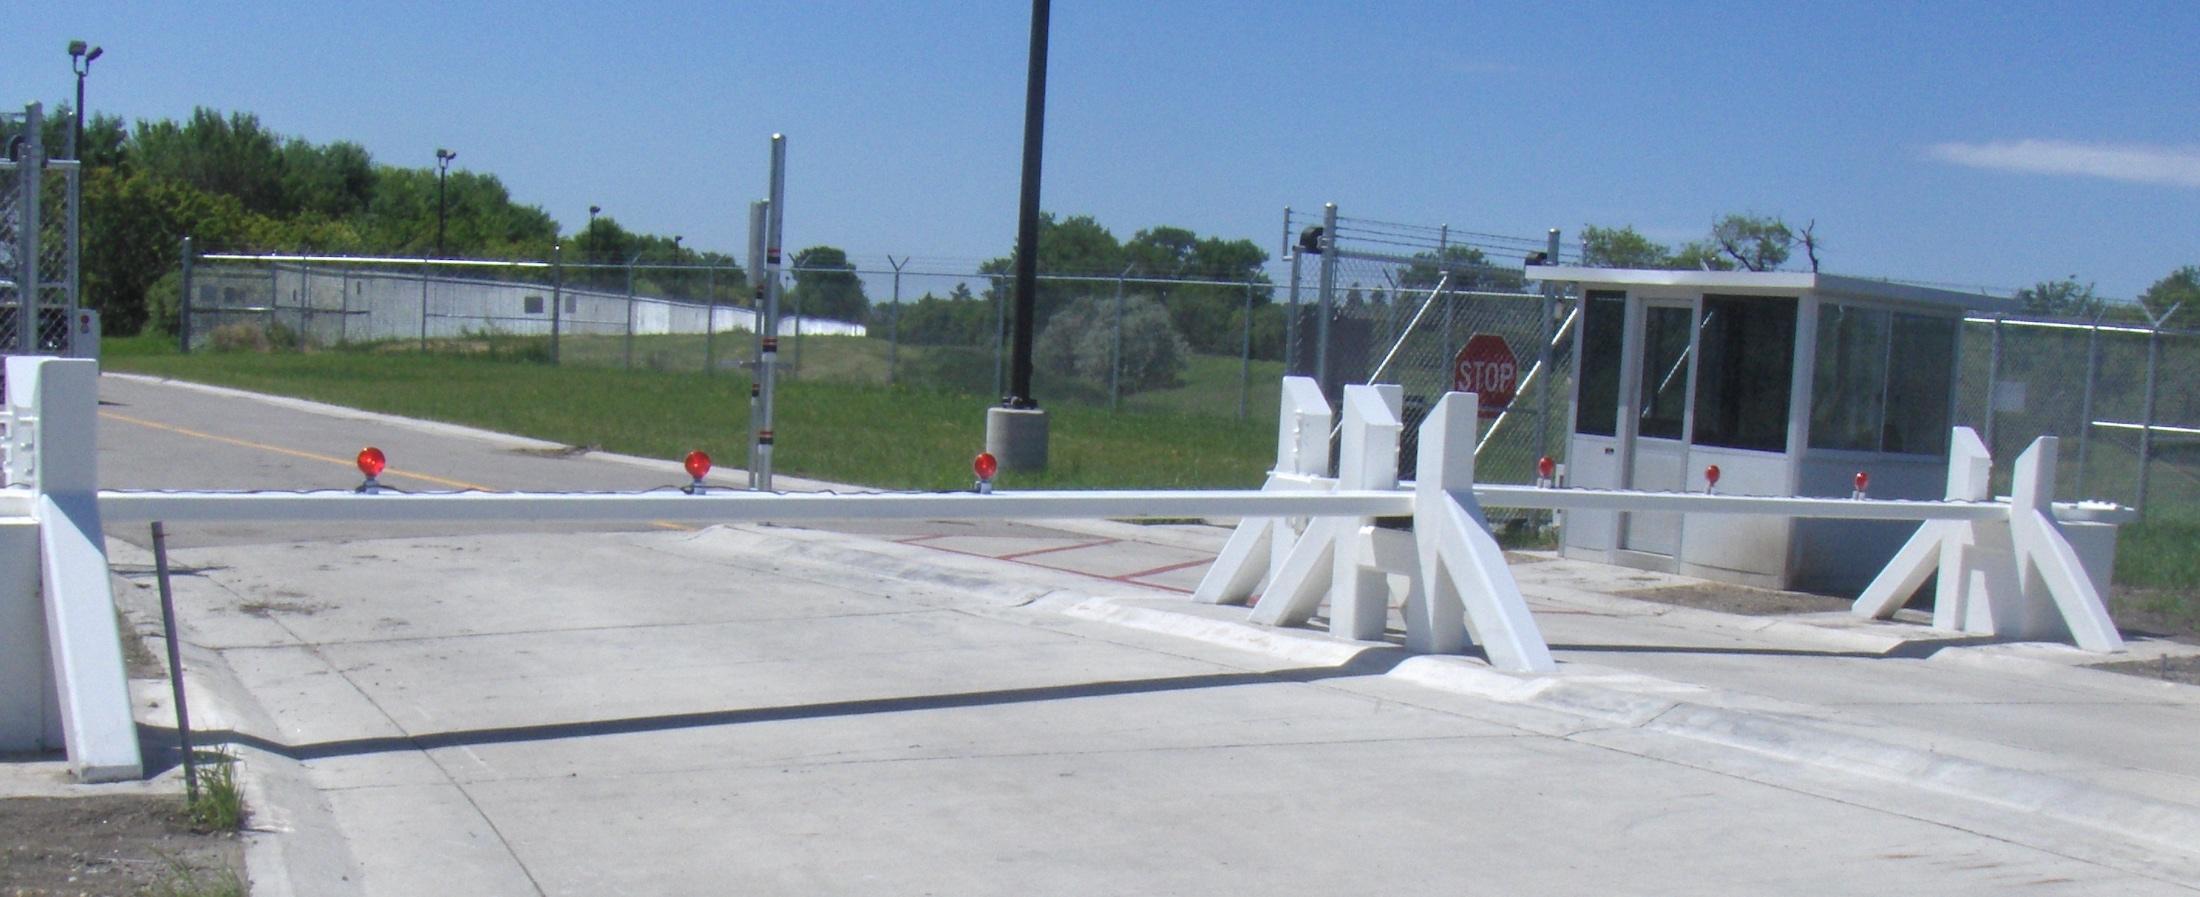 DSC7000 High Security Beam Barricade | Delta Scientific